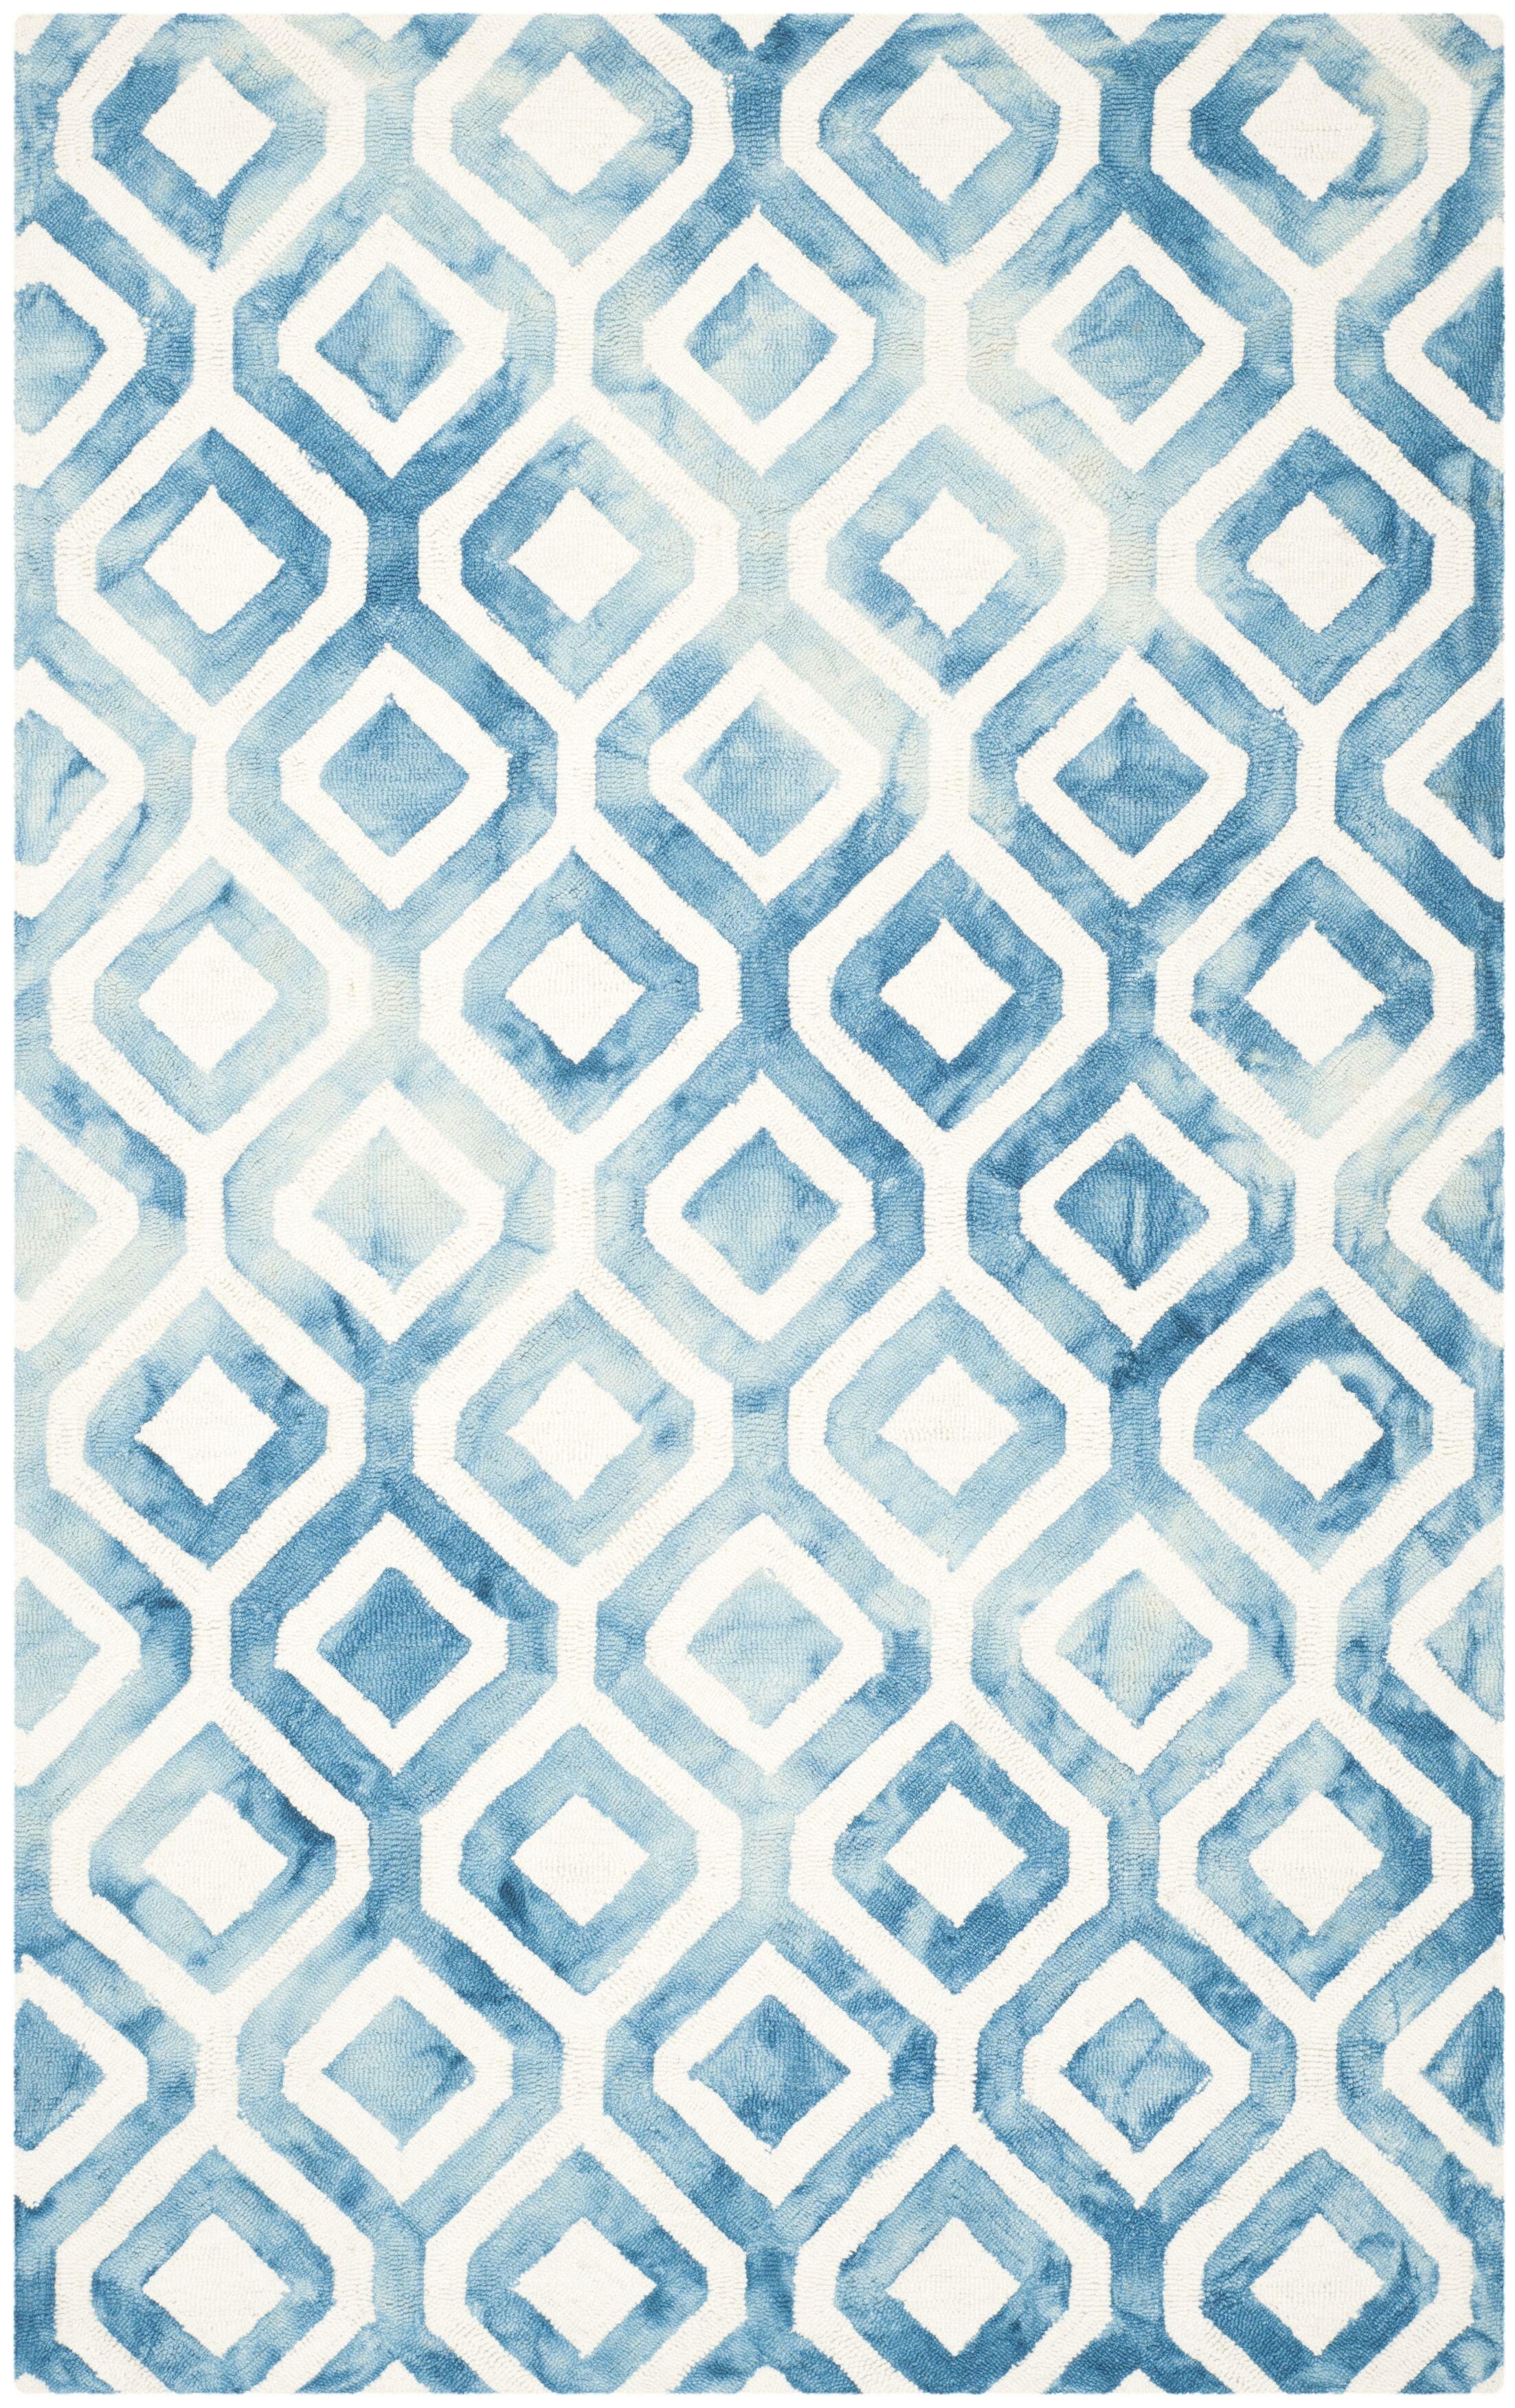 Bettina Hand-Woven Ivory/Blue Kids Rug Rug Size: Rectangle 4' x 6'